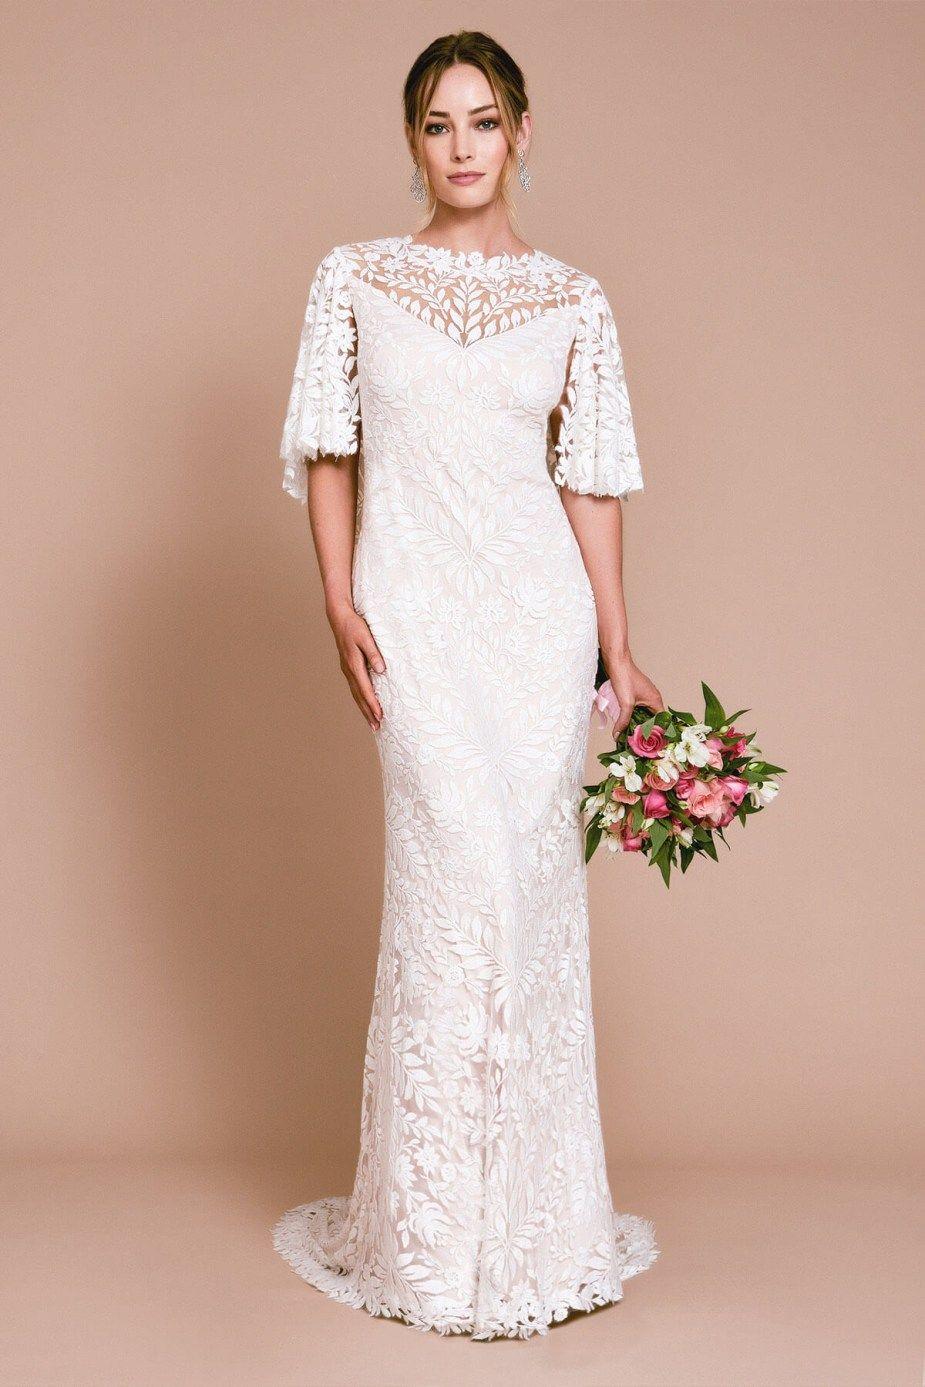 New Tadashi Shoji Wedding Gowns Wedding Dresses For Budget Brides Hochzeit [ 1387 x 925 Pixel ]